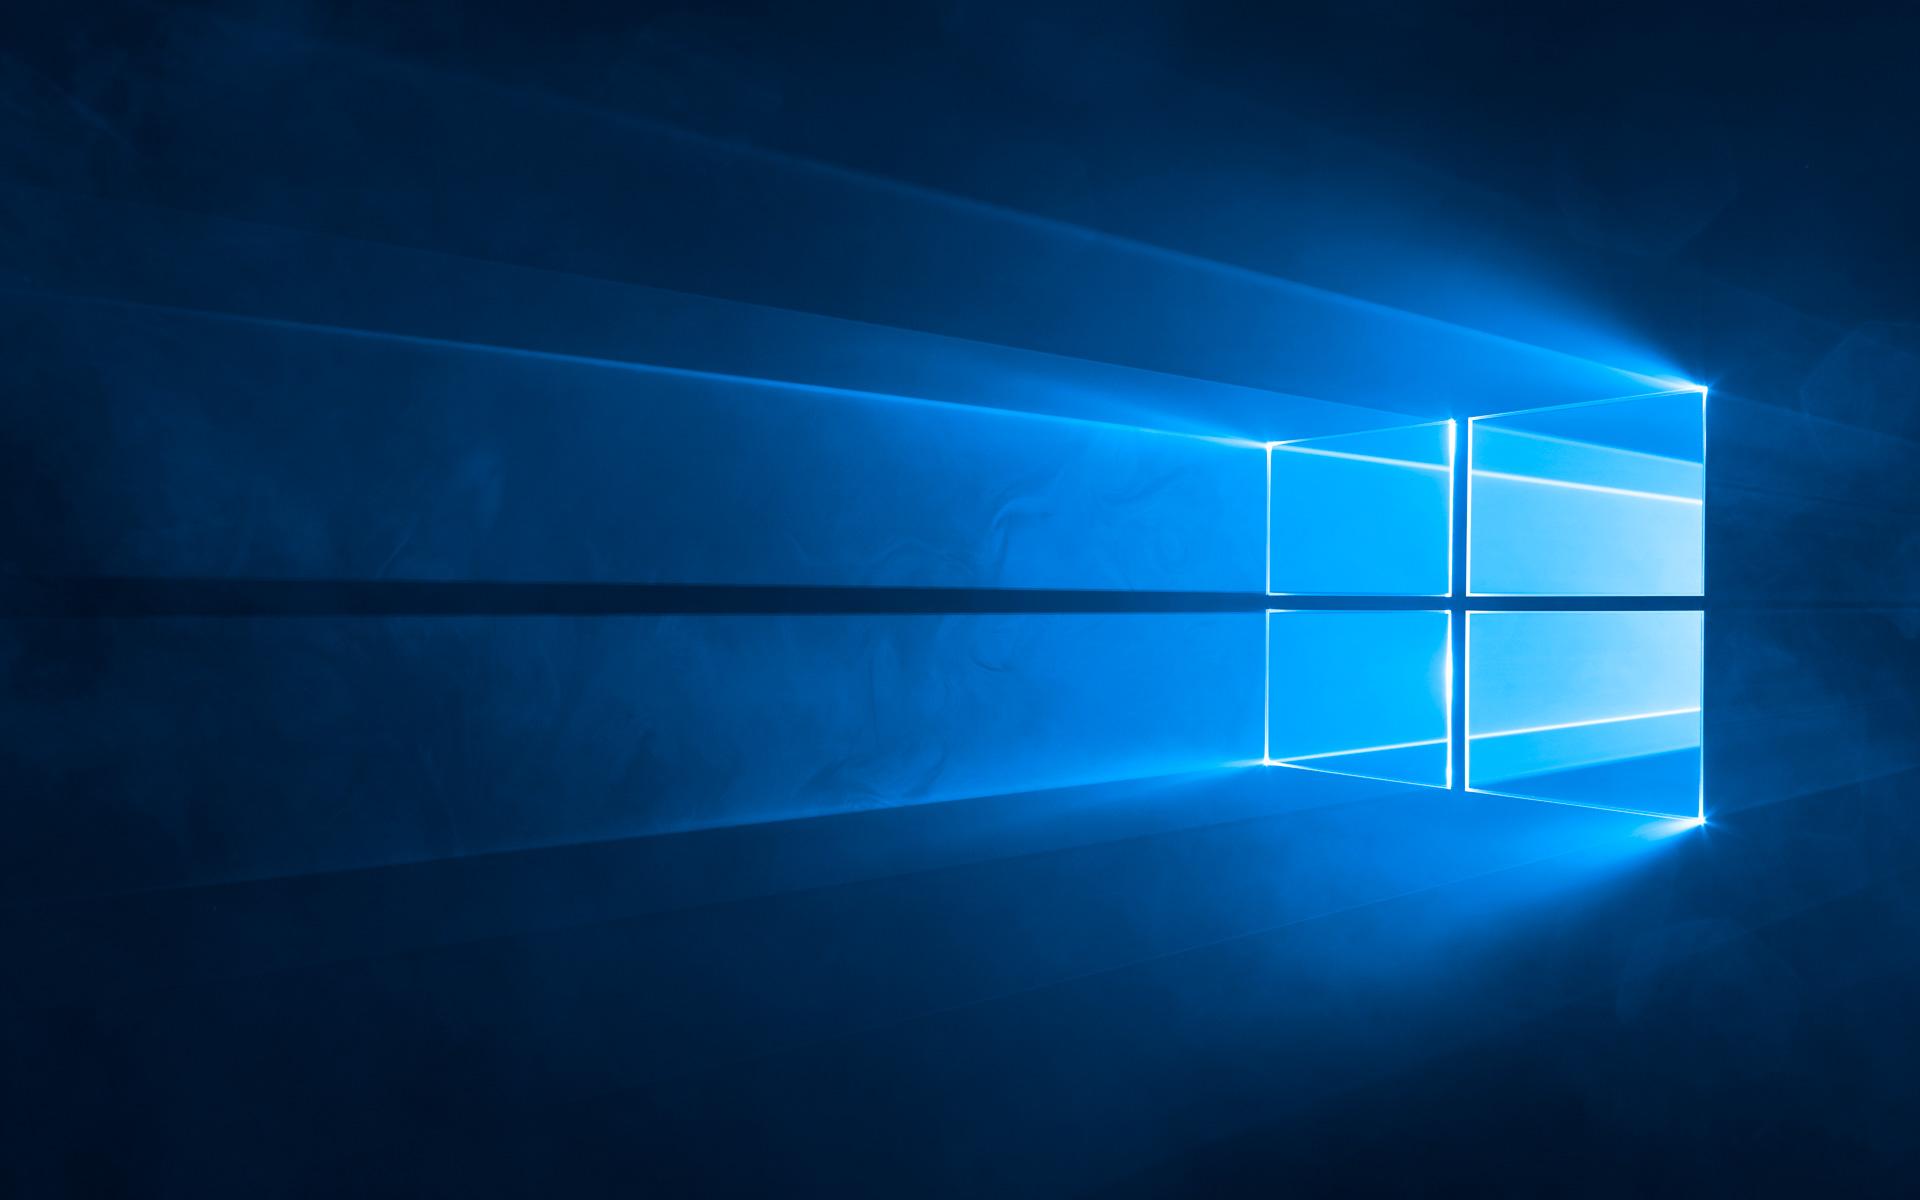 microsoft fix it ダウンロード windows10